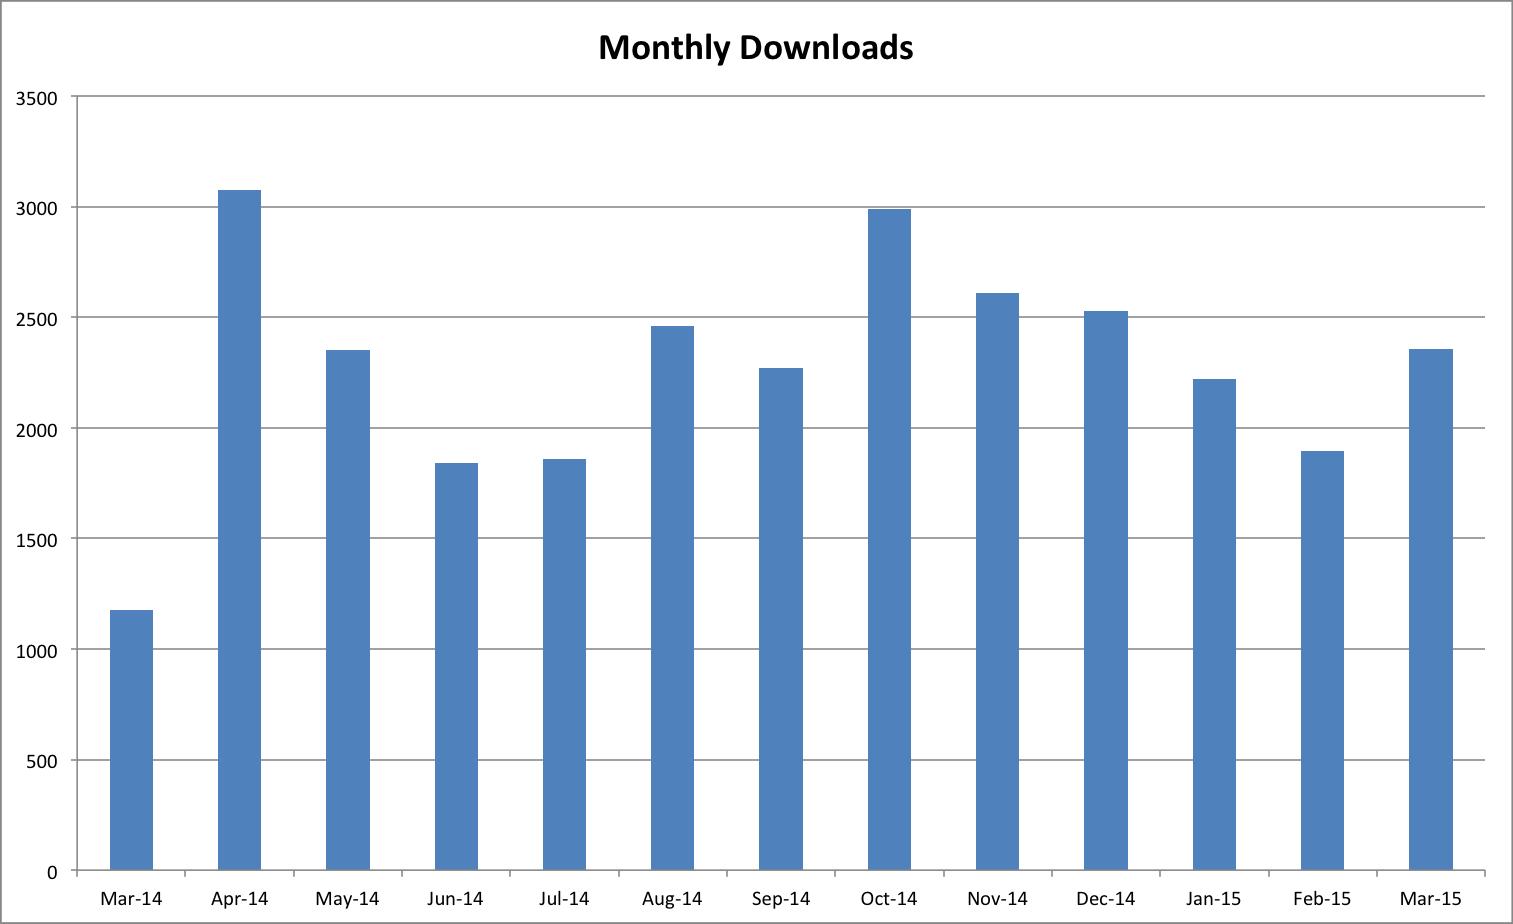 OAPEN Monthly Downloads April 2015